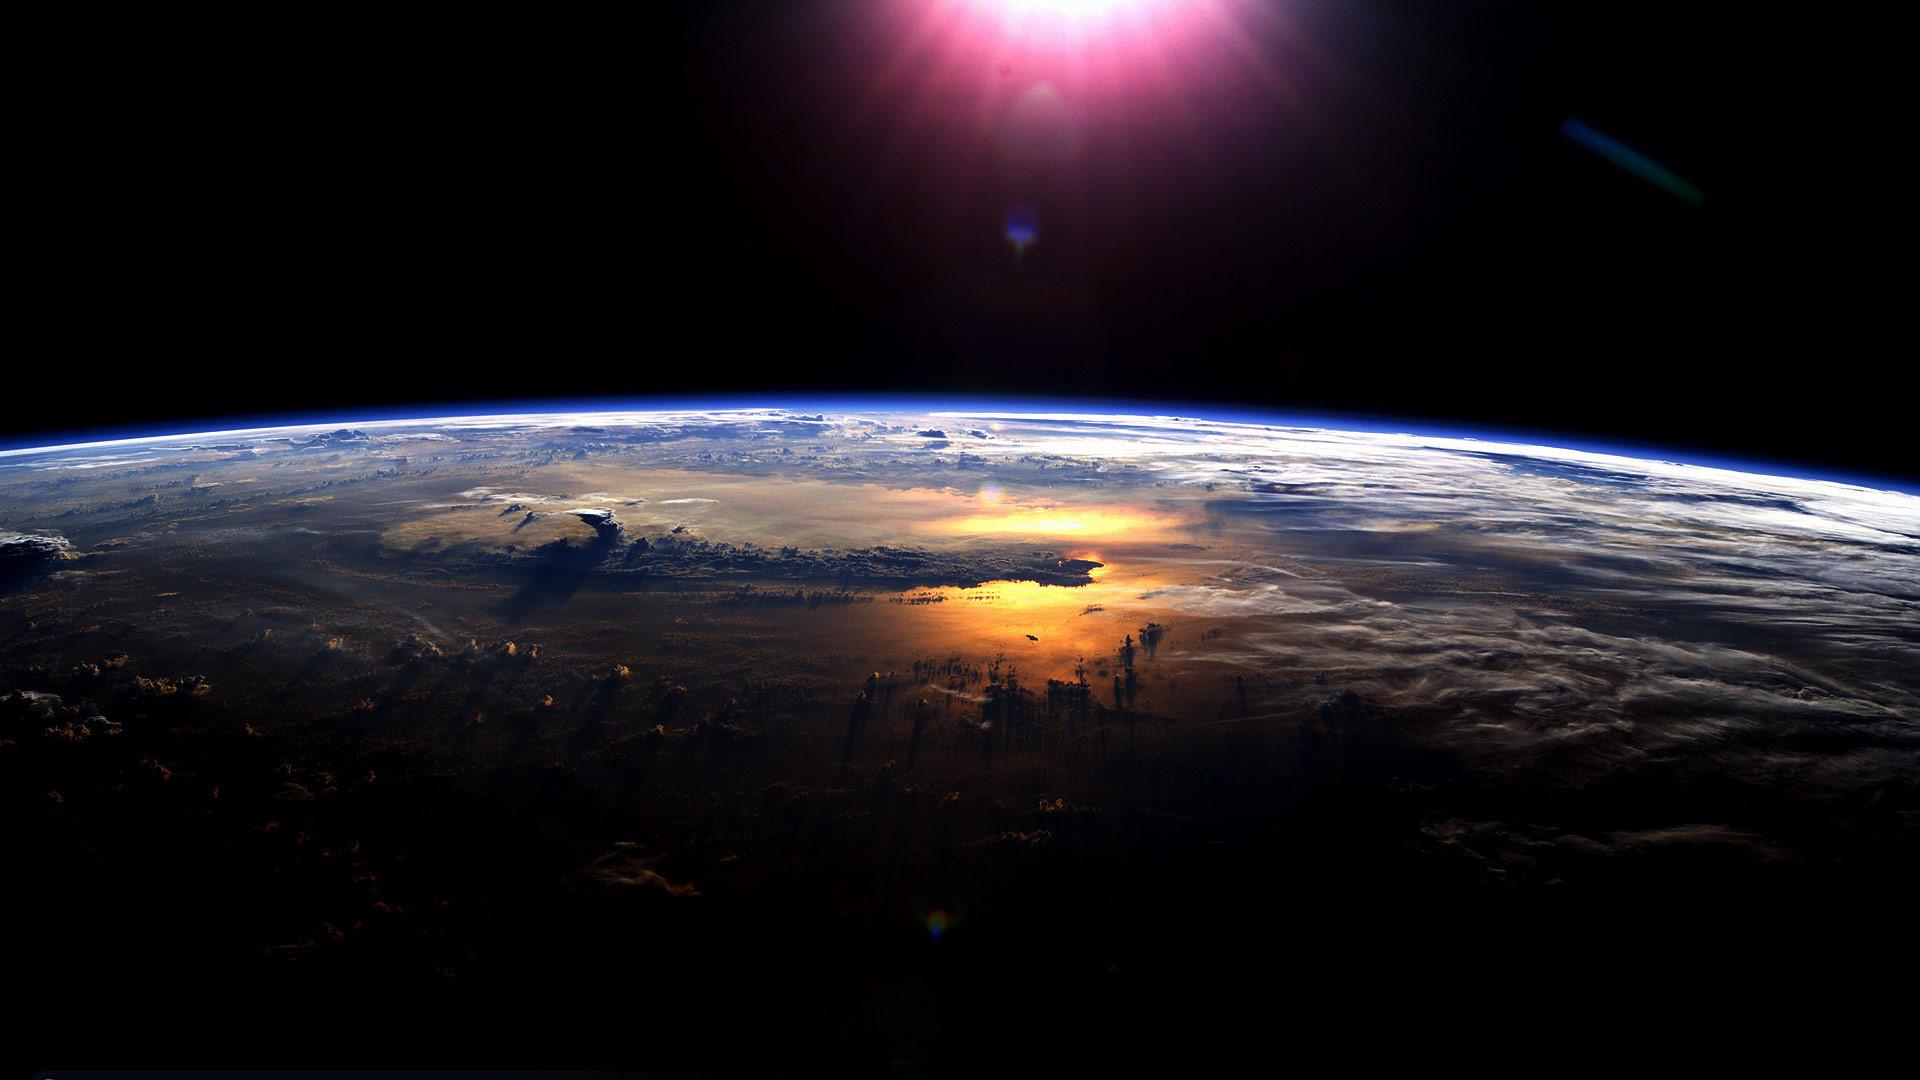 Earth HD. Earth HD · Earth High Definition Wallpaper